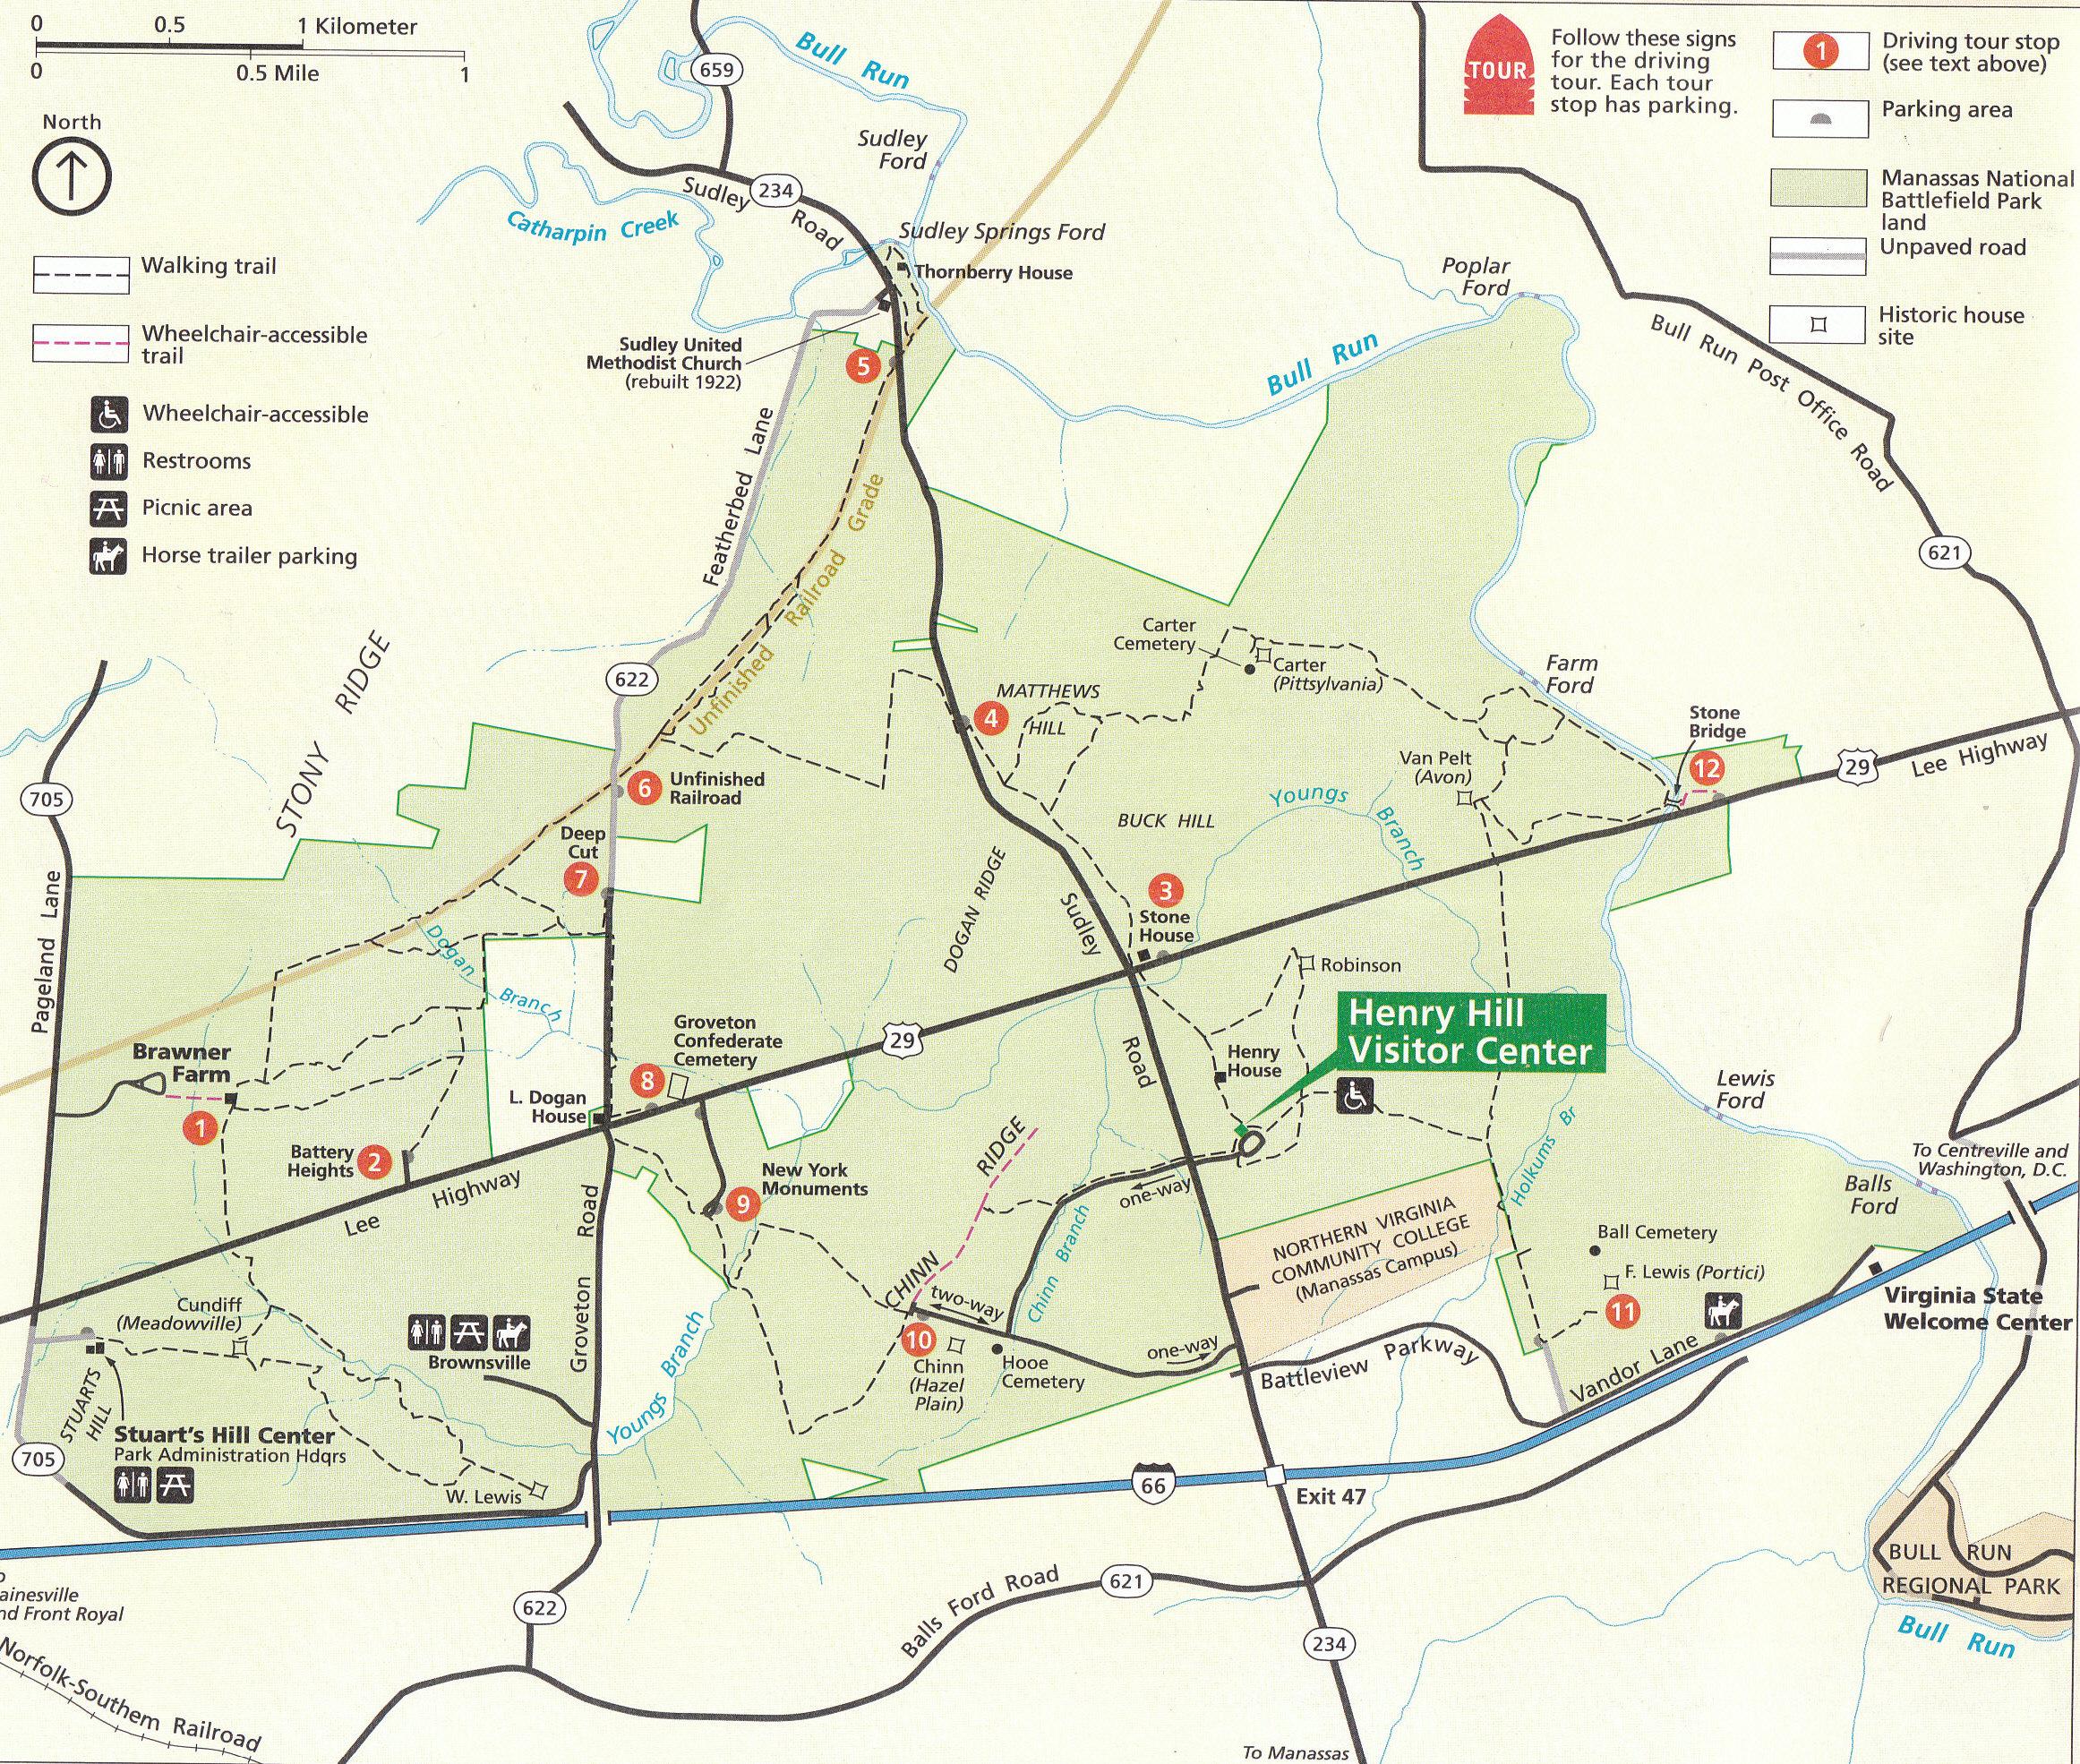 Manasses Battlefield Park Nature Journaling